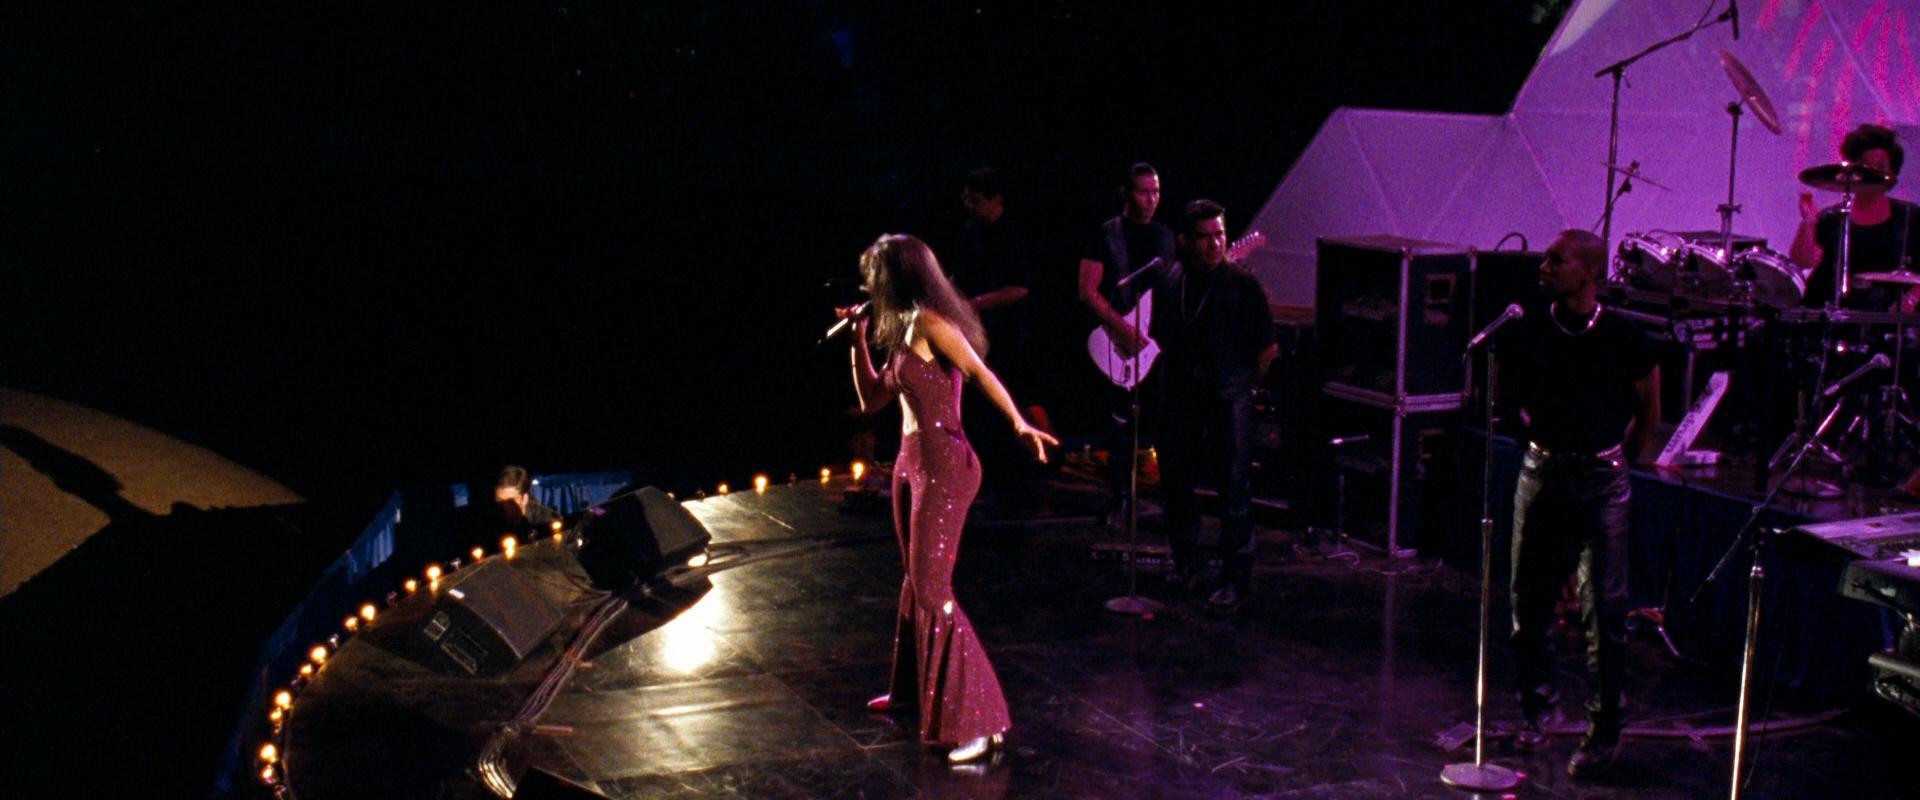 Selena (1997) Extended Cut 1080p BDRip Latino - Ingles